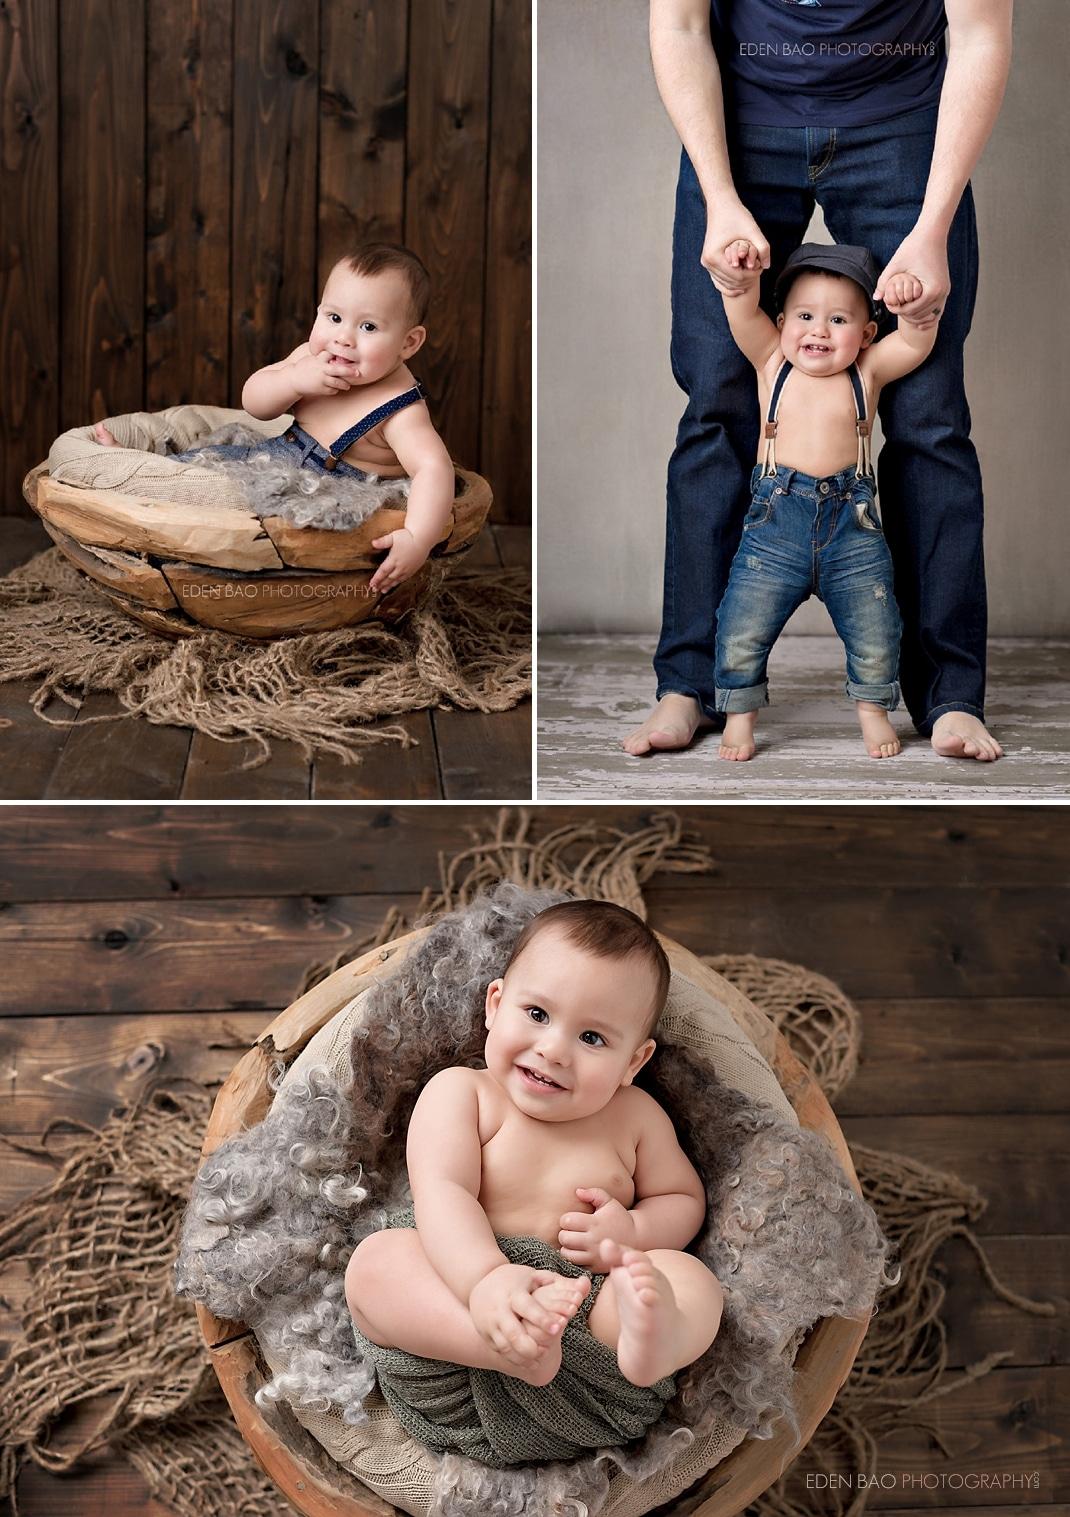 Baby Photographer Seattle wood bowl 2